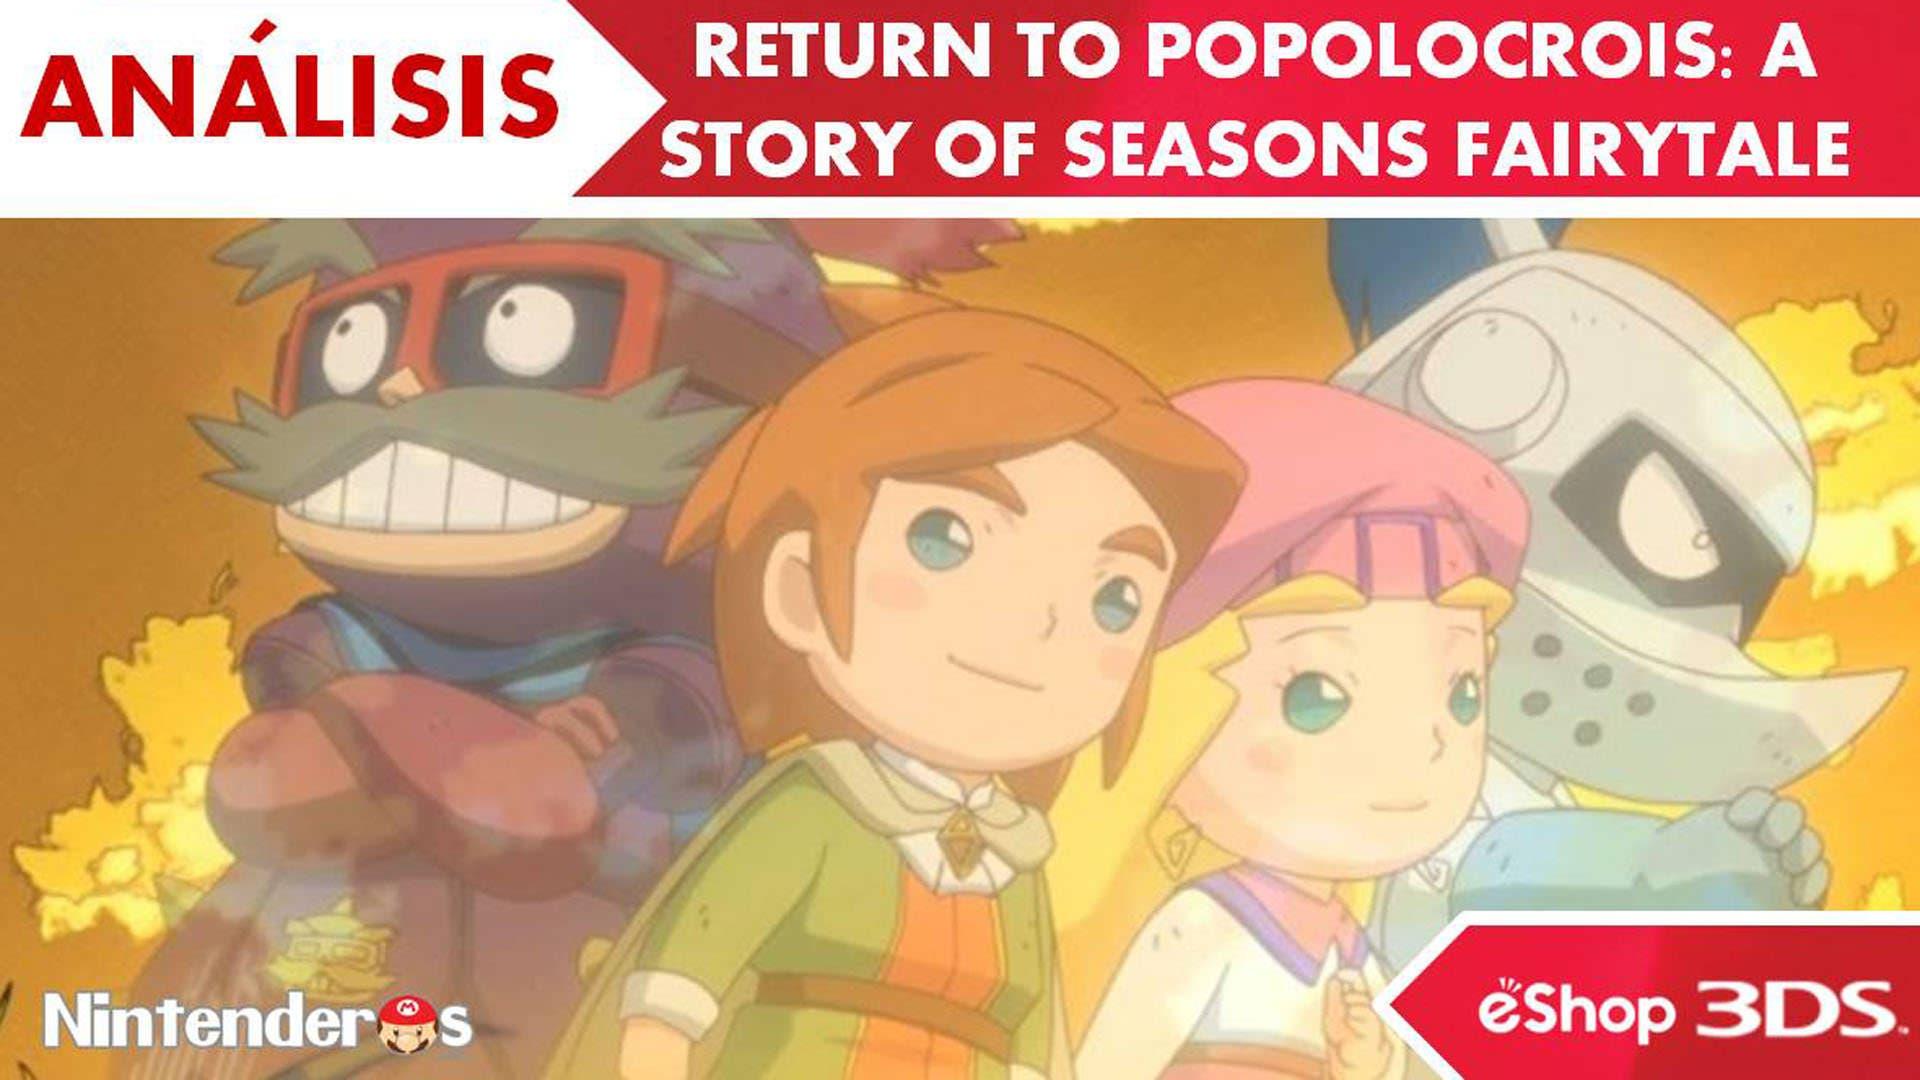 [Análisis] 'Return to Popolocrois: A Story of Seasons Fairytale' (eShop 3DS)